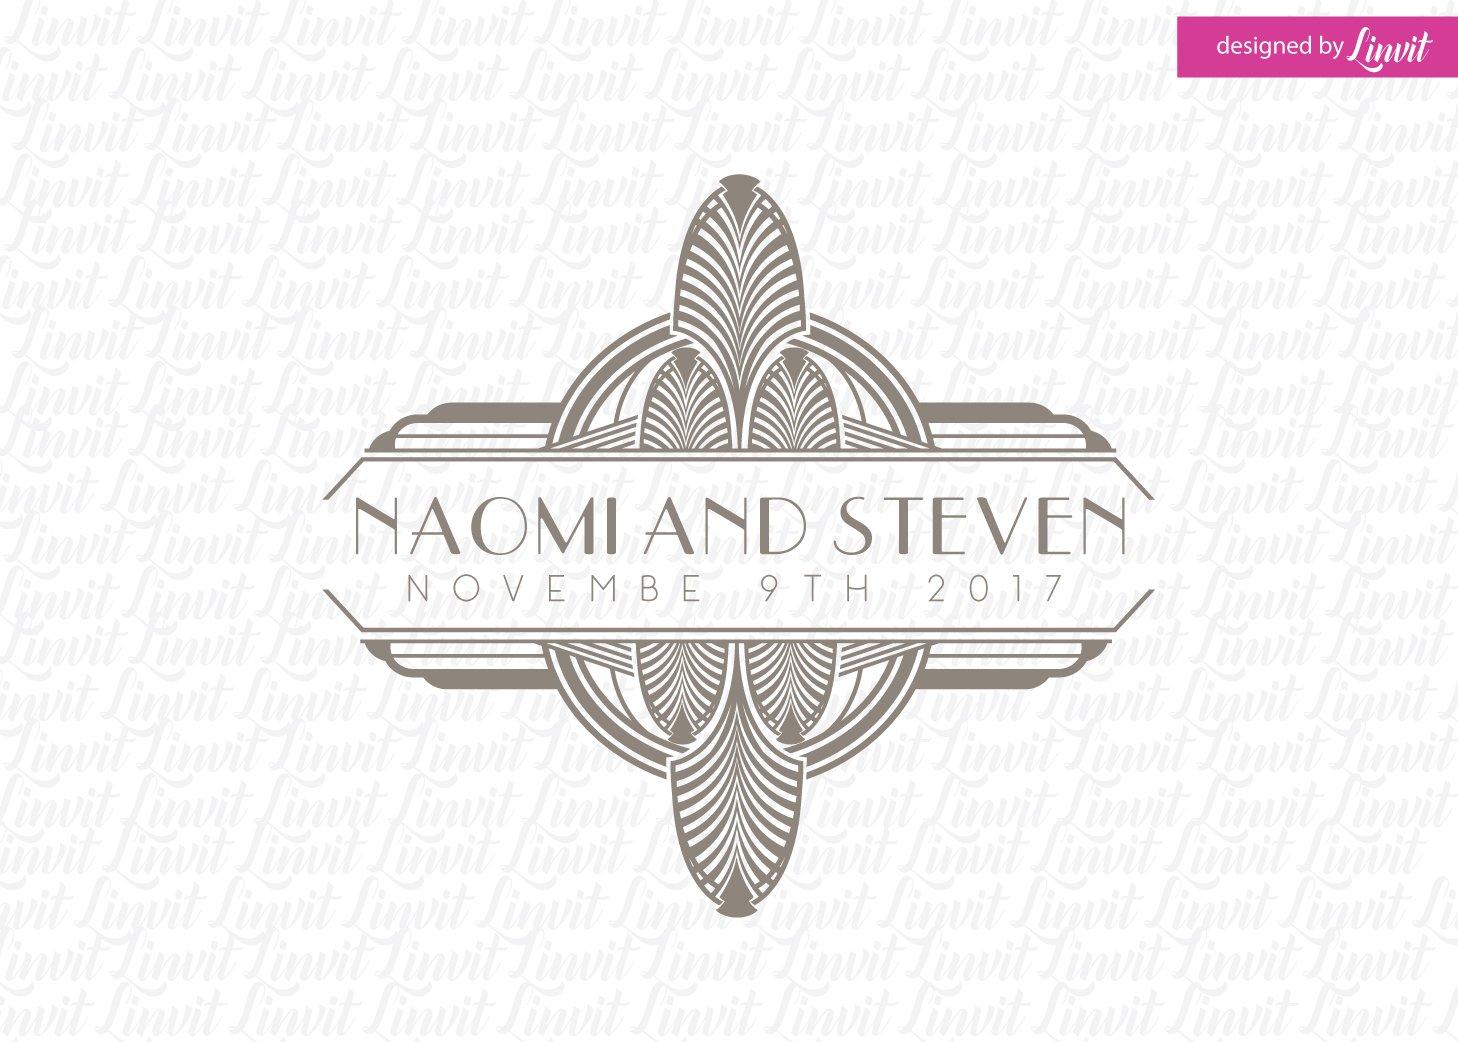 art deco wedding logo logo templates creative market. Black Bedroom Furniture Sets. Home Design Ideas